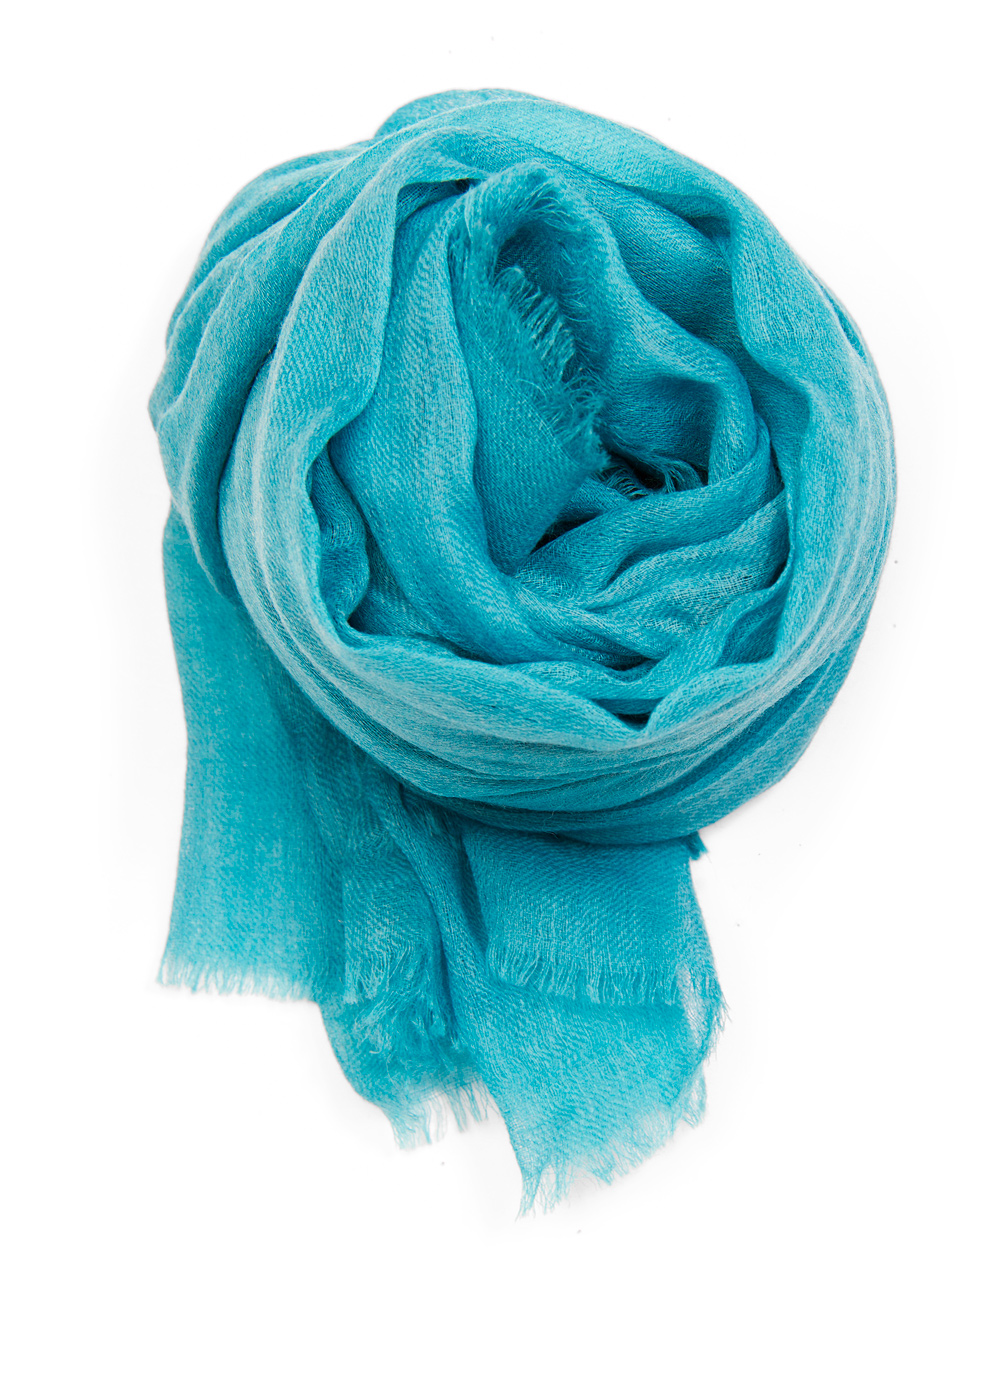 Lyst - Mango Touch - Cashmere Foulard in Blue 0baebc94ea2